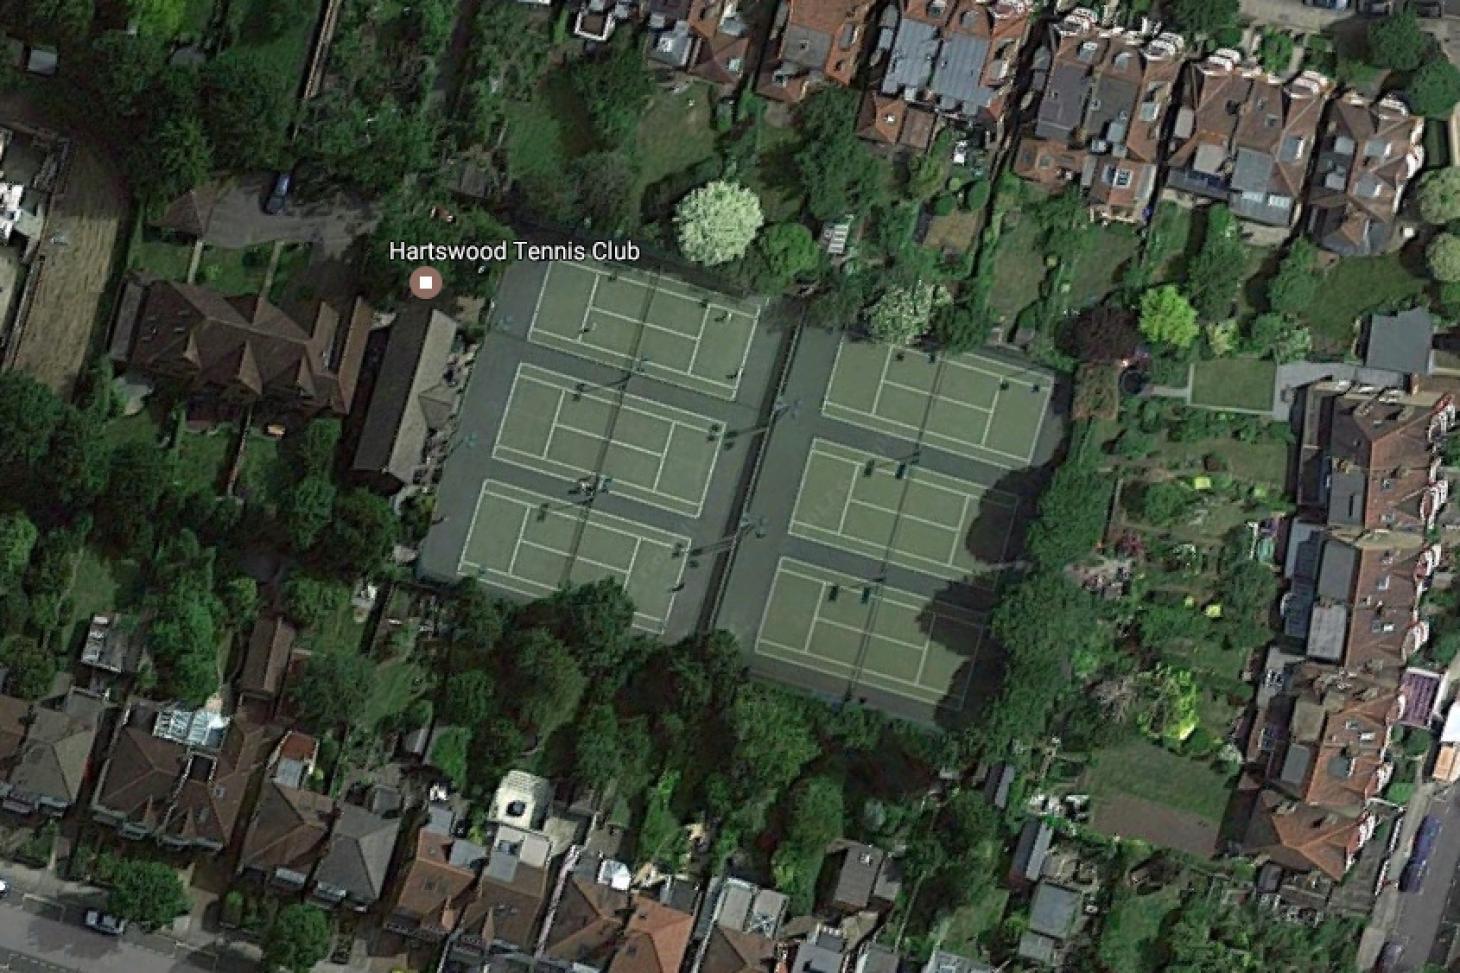 Hartswood Tennis Club Outdoor | Hard (macadam) tennis court